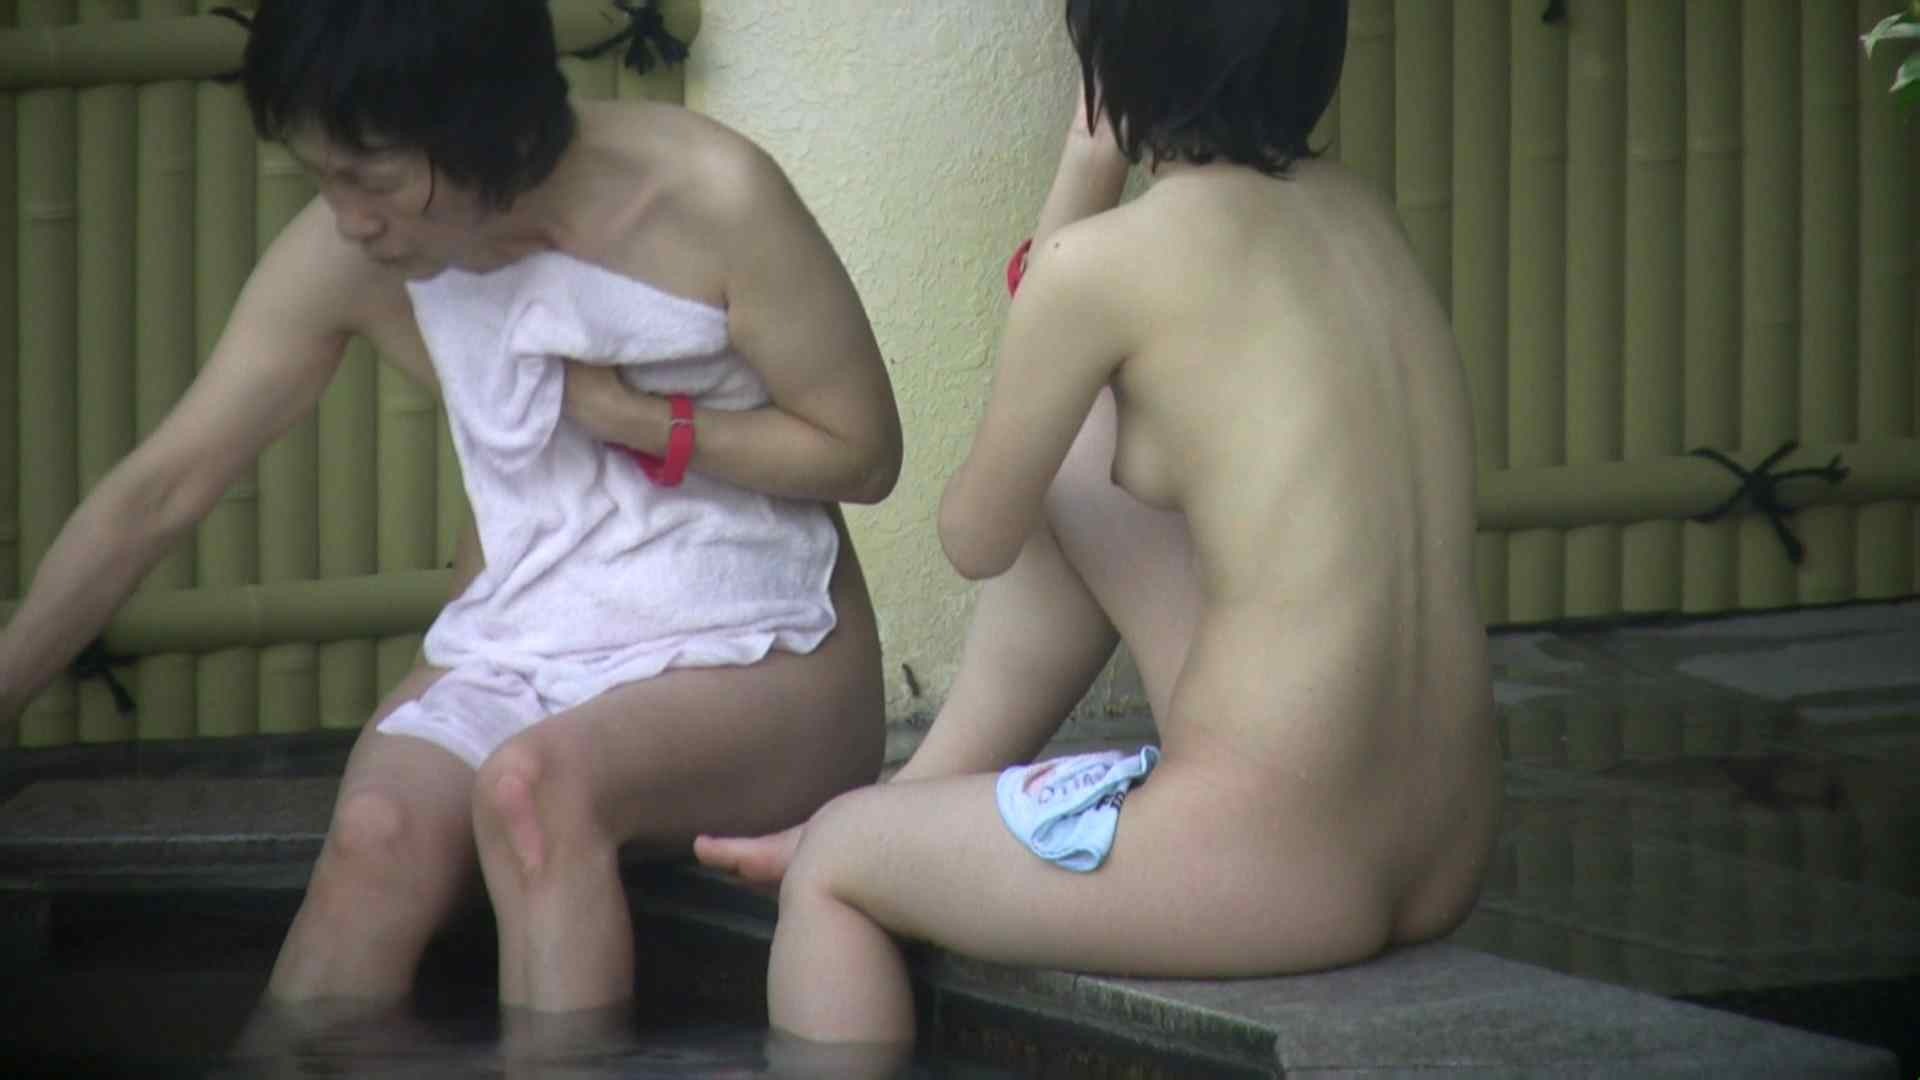 Aquaな露天風呂Vol.06【VIP】 露天 オマンコ無修正動画無料 113PICs 74